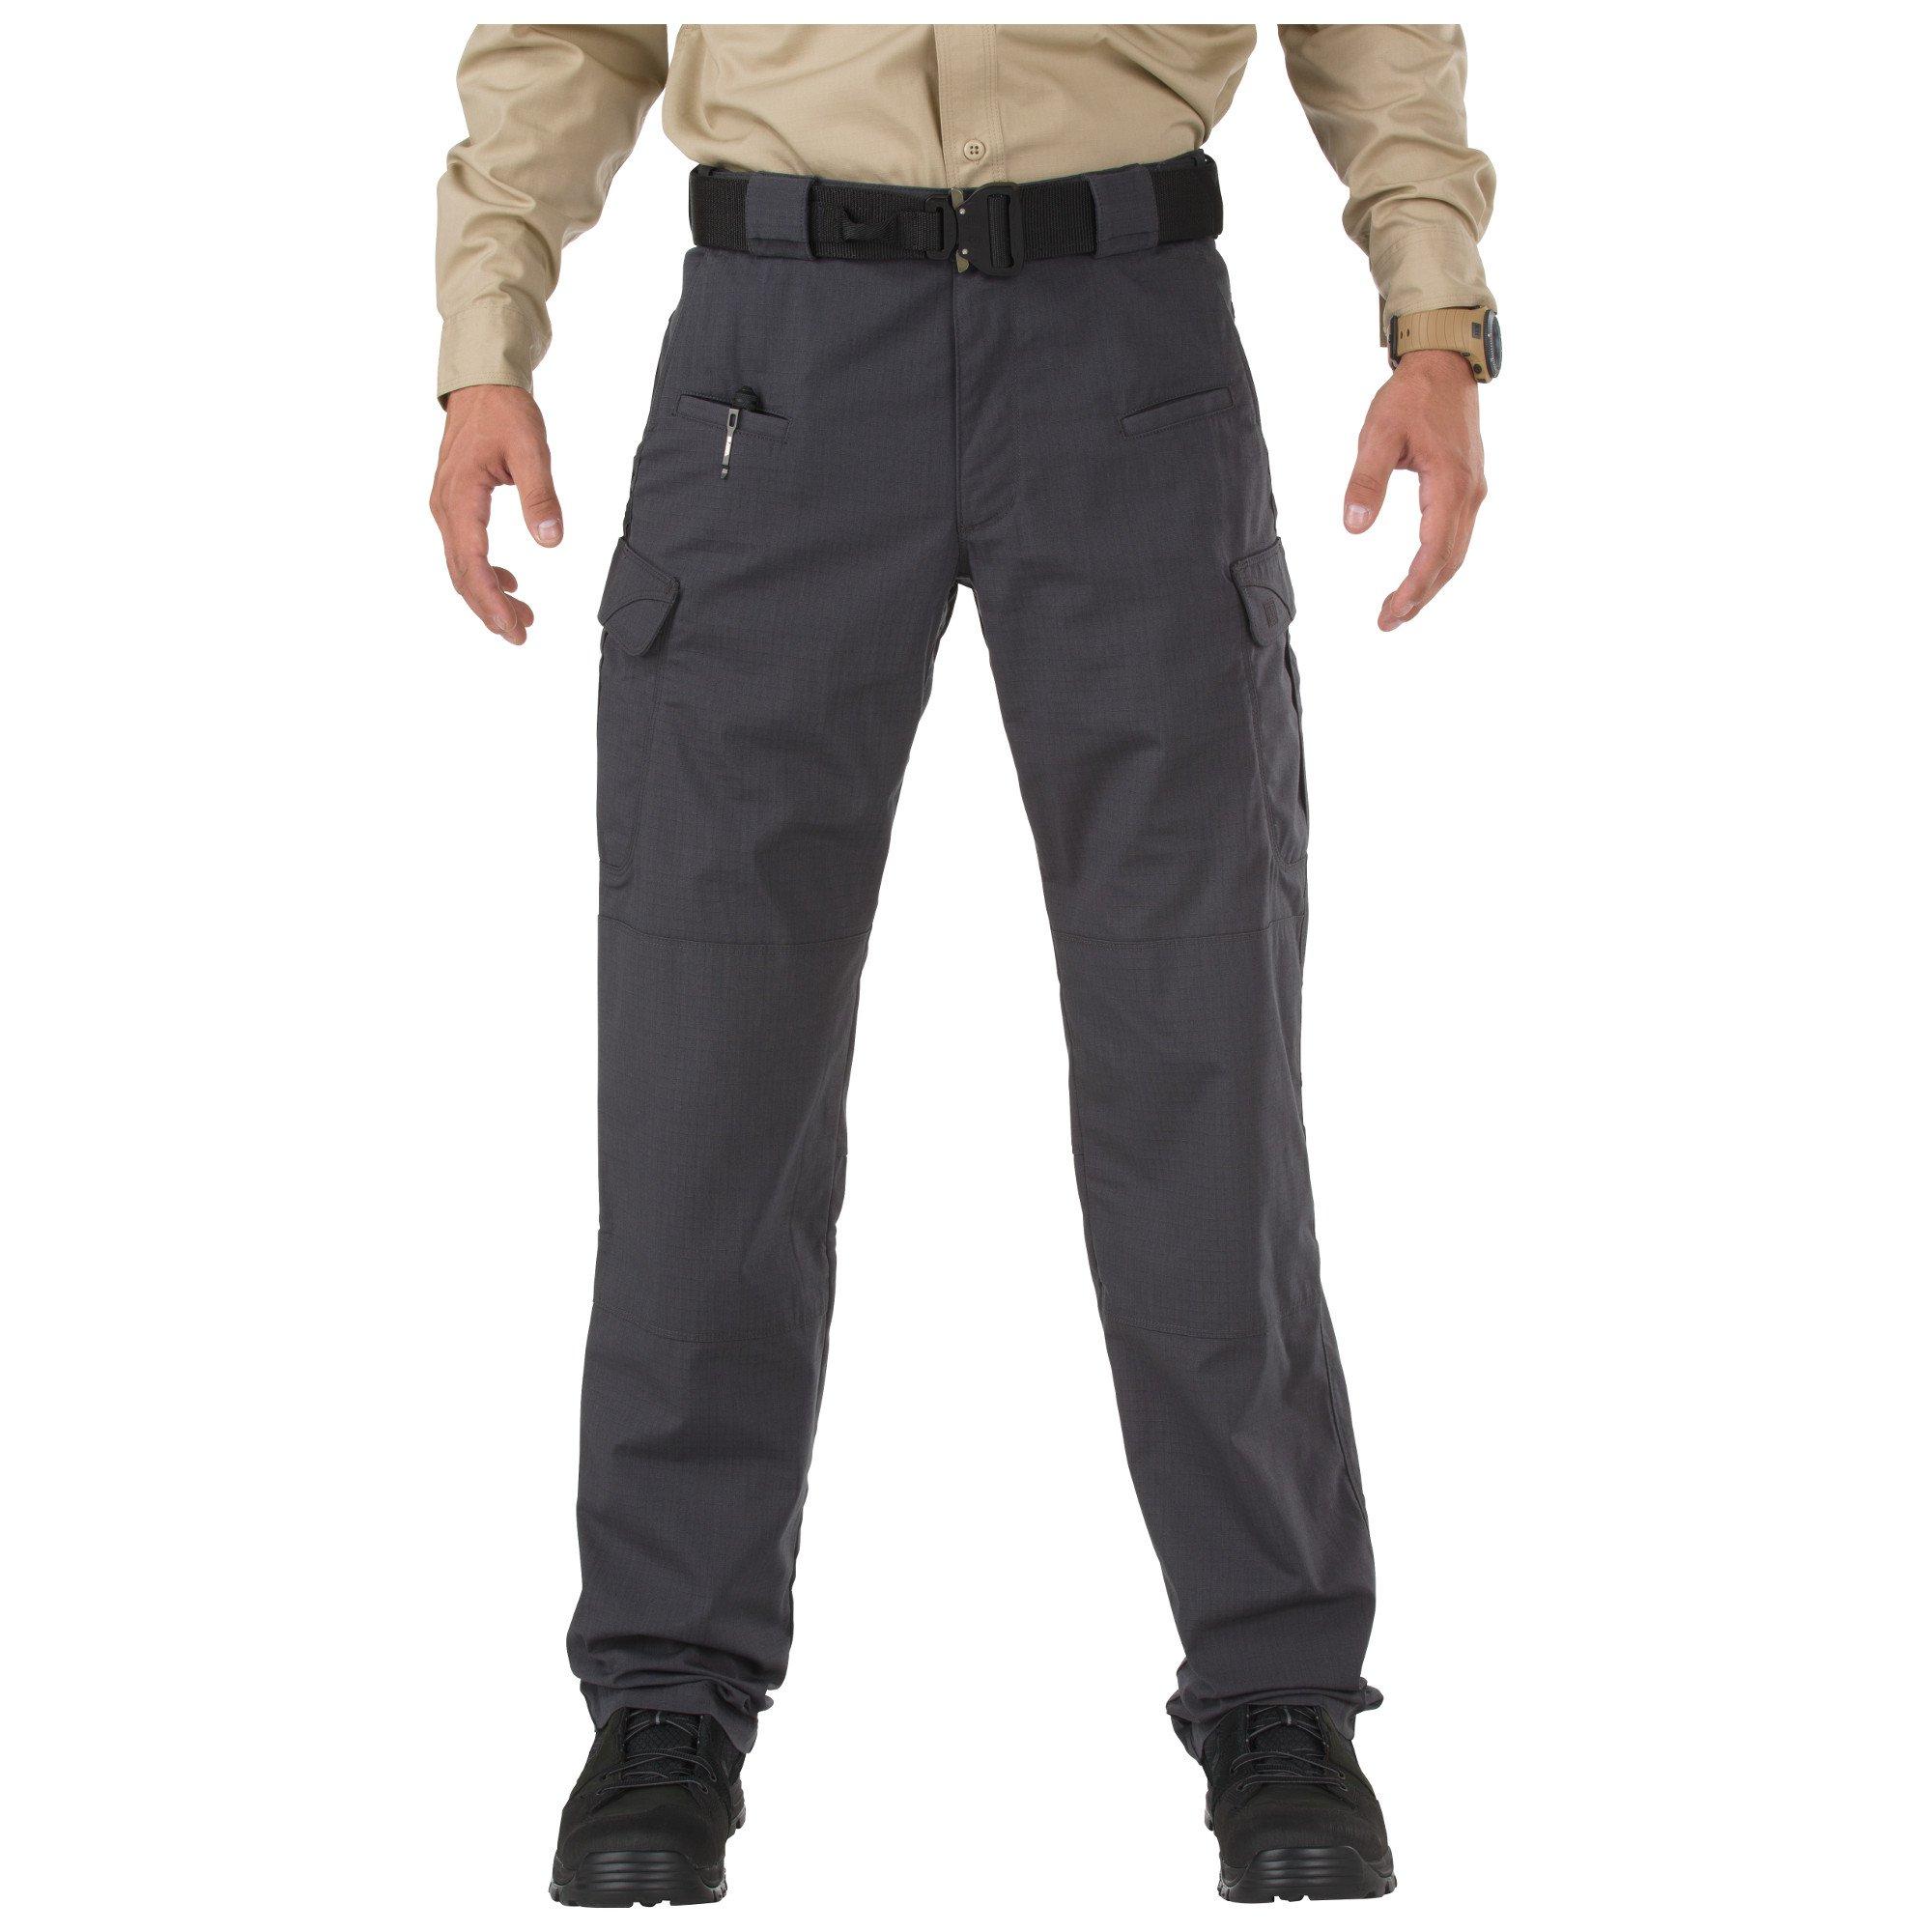 5.11 Stryke Pant – Charcoal